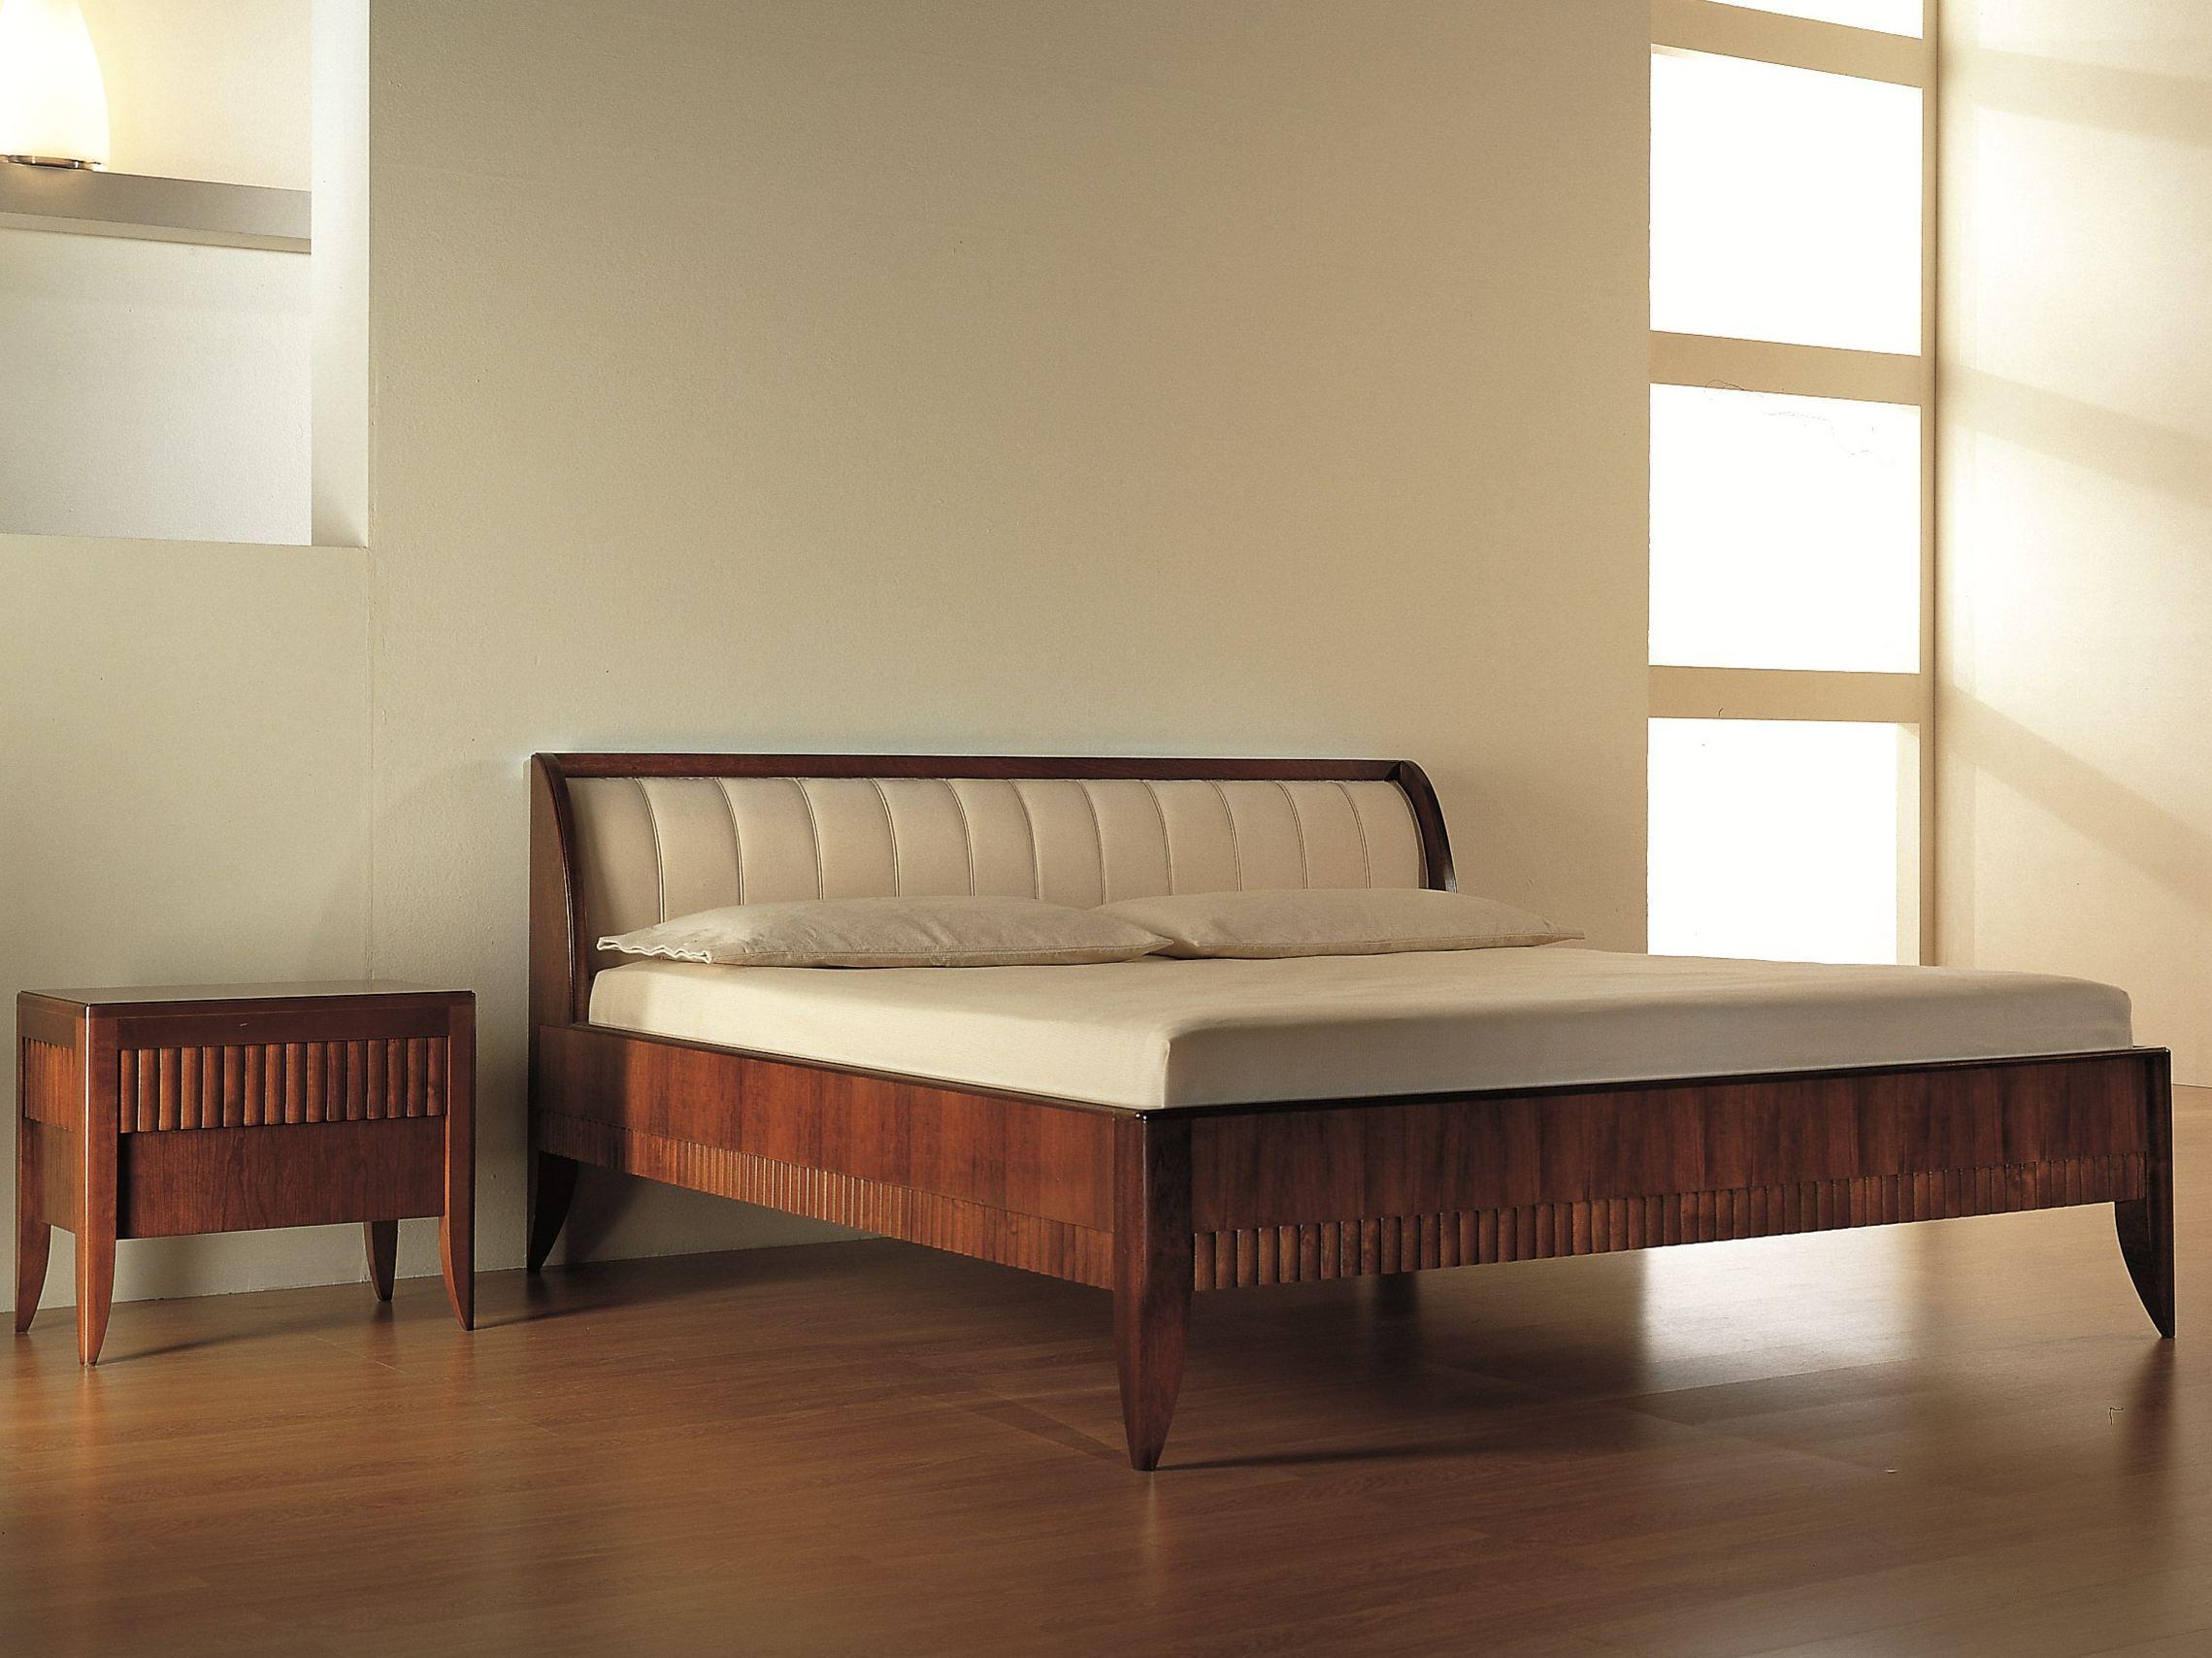 Mobili Morelato ~ Rulman bedside table by morelato design centro ricerche maam